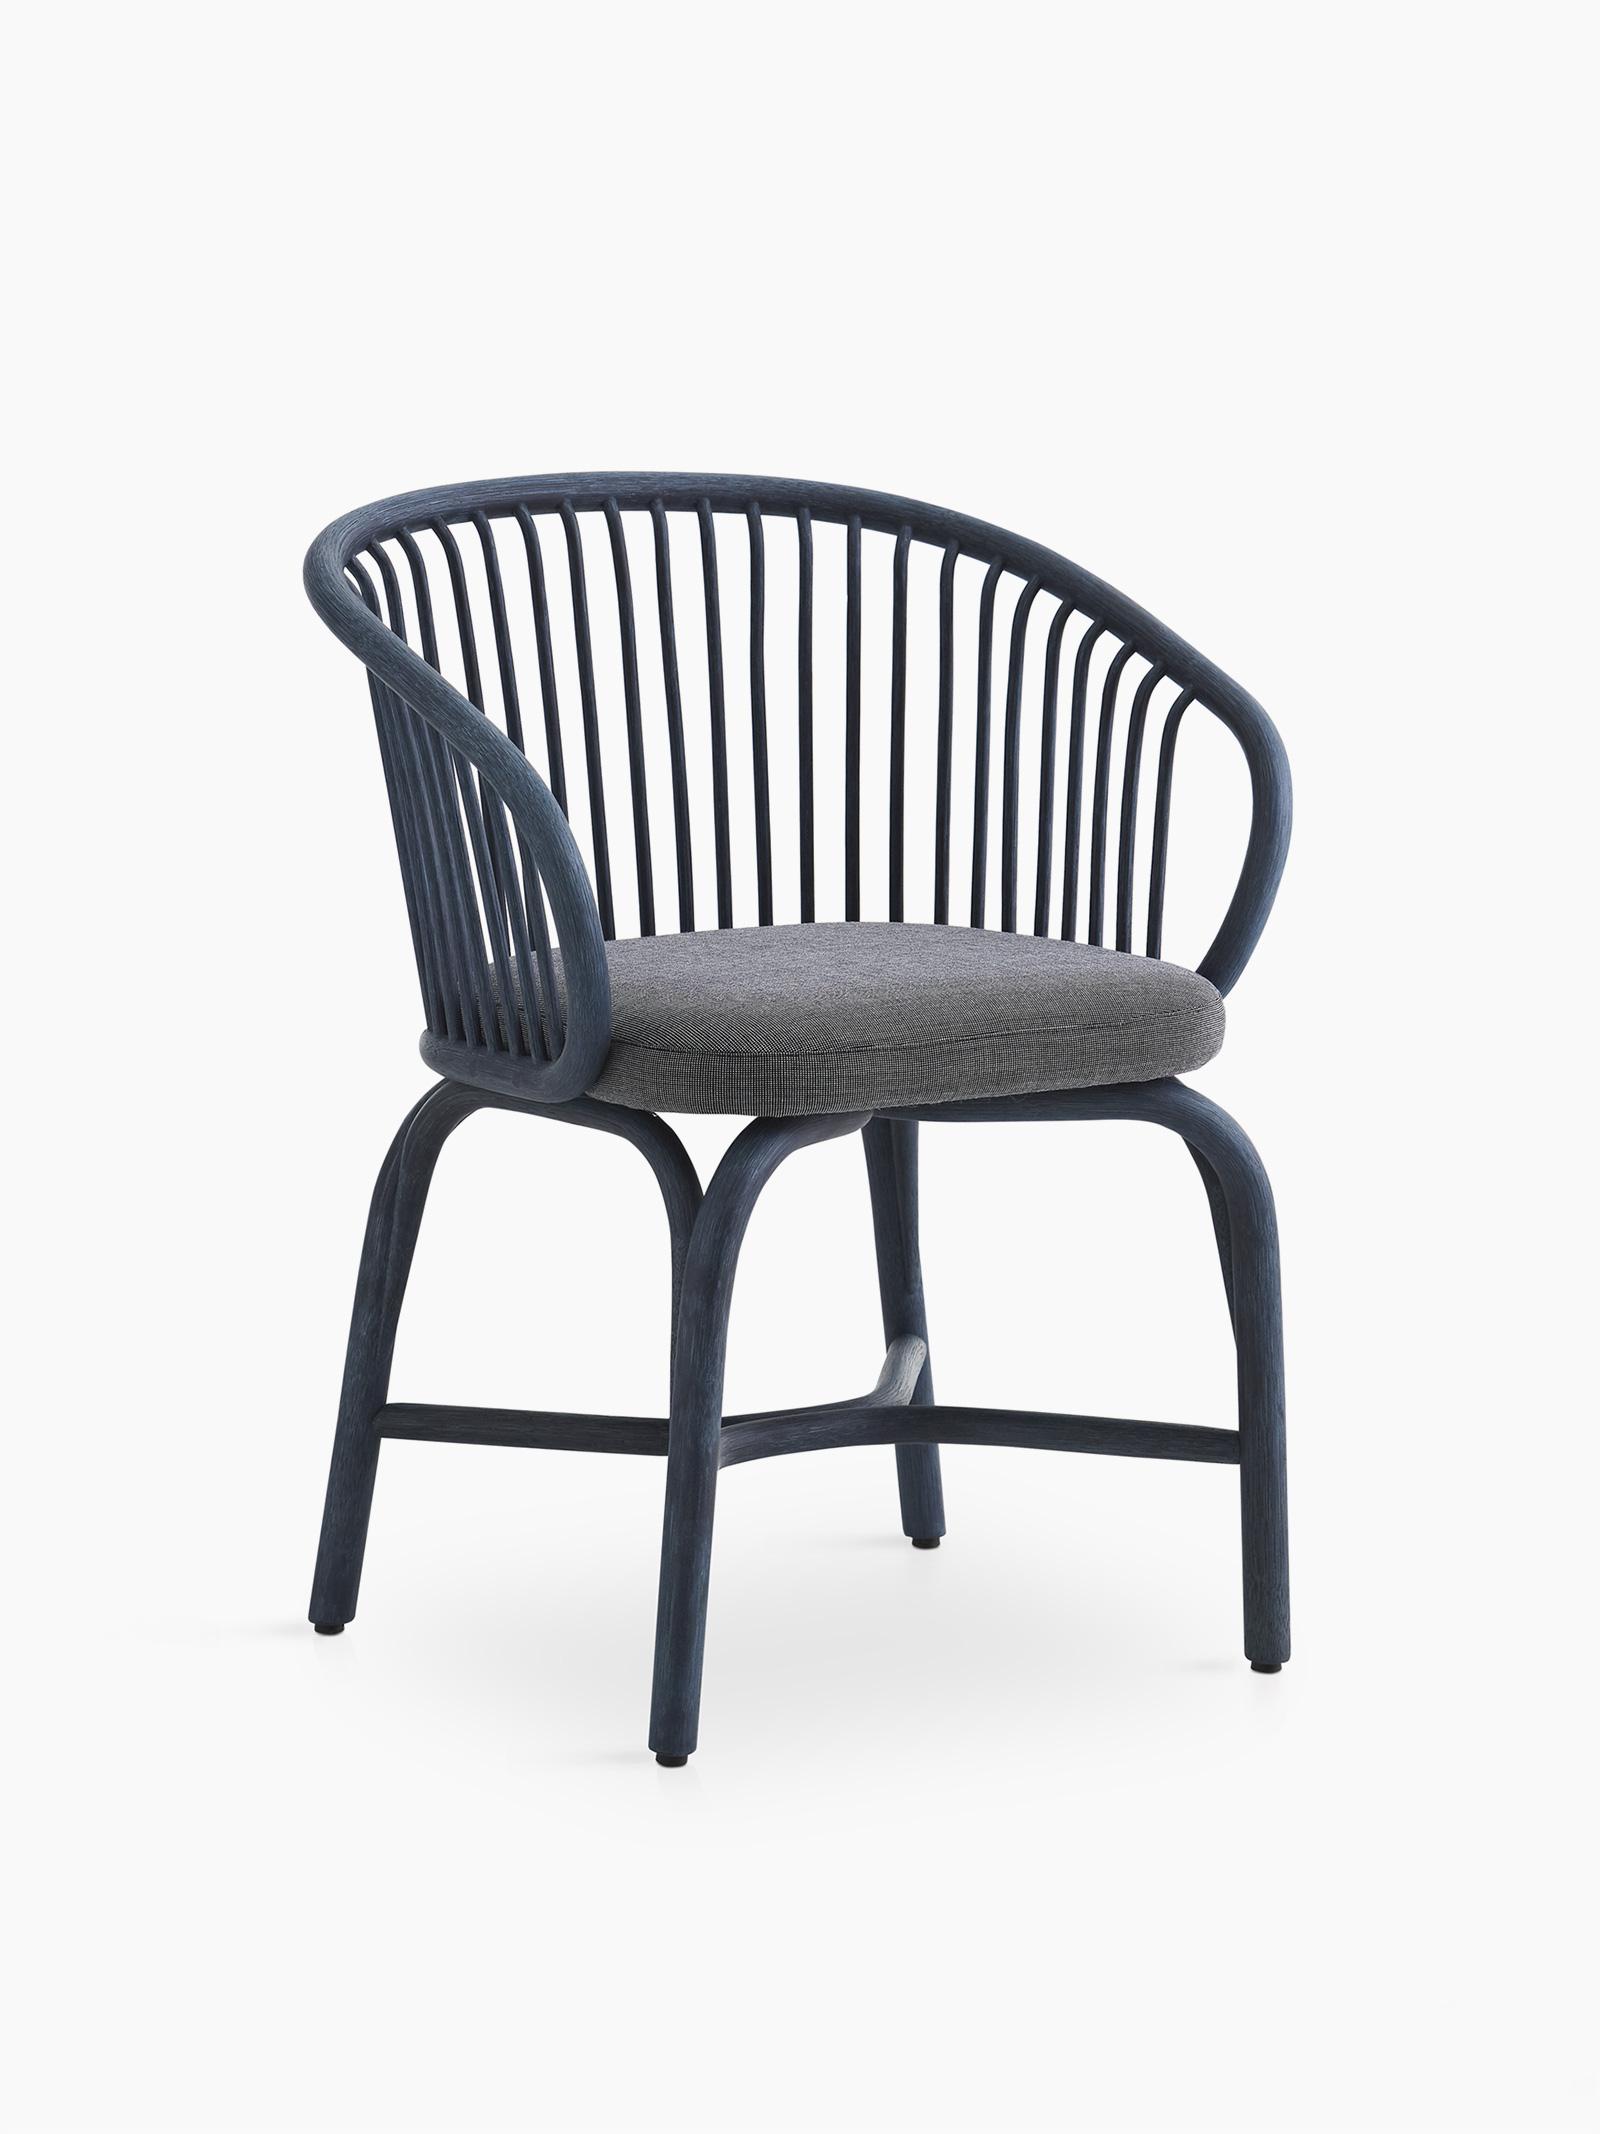 TinnappleMetz-Expormim-huma-armchair-05